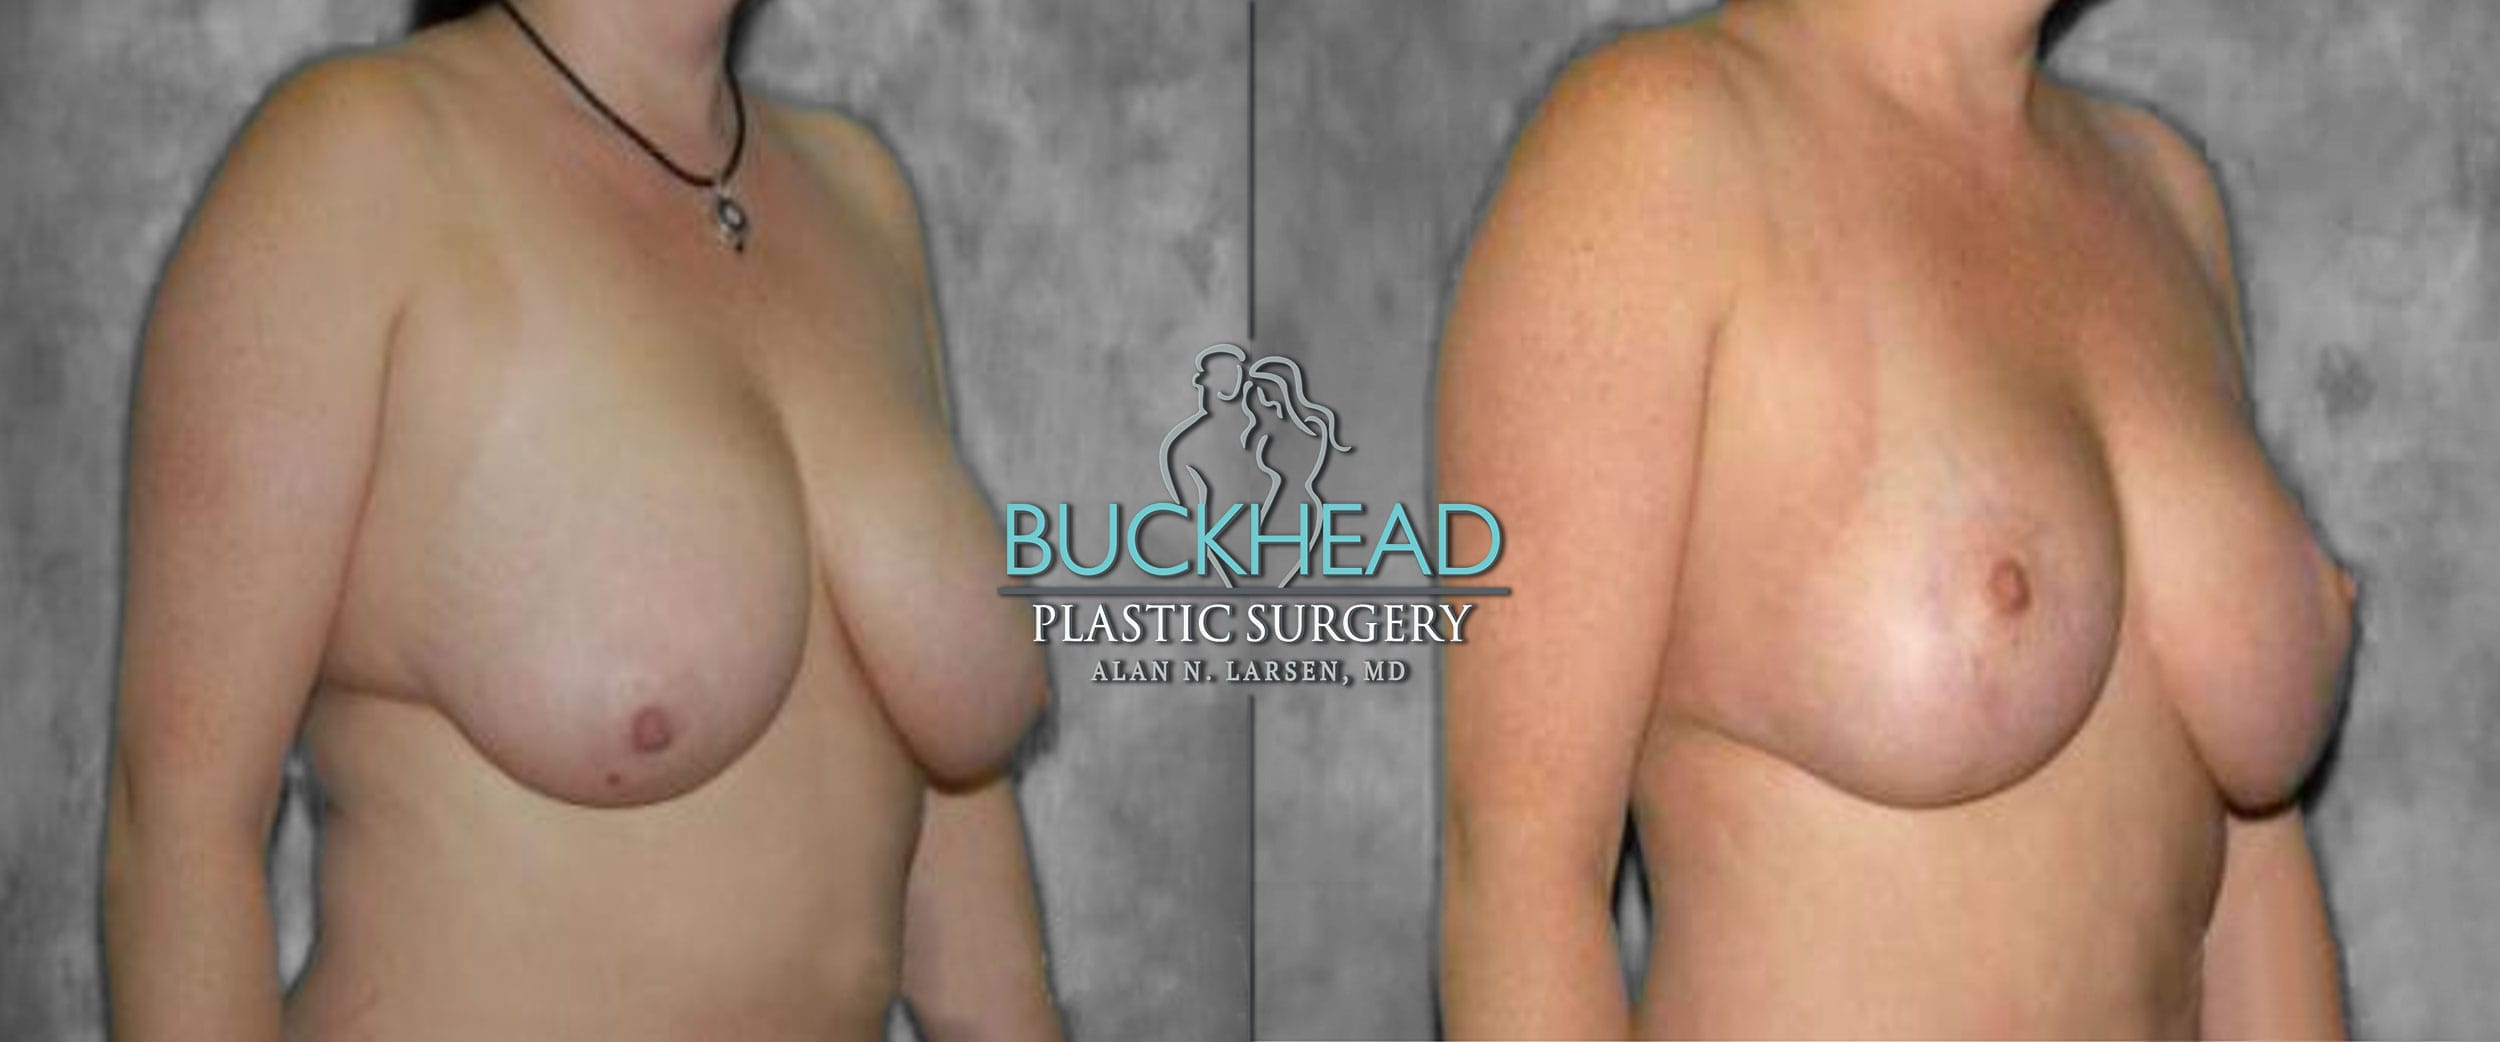 Before and After Photo Gallery | Breast Lift | Buckhead Plastic Surgery | Alan N. Larsen, MD | Board-Certified Plastic Surgeon | Atlanta GA